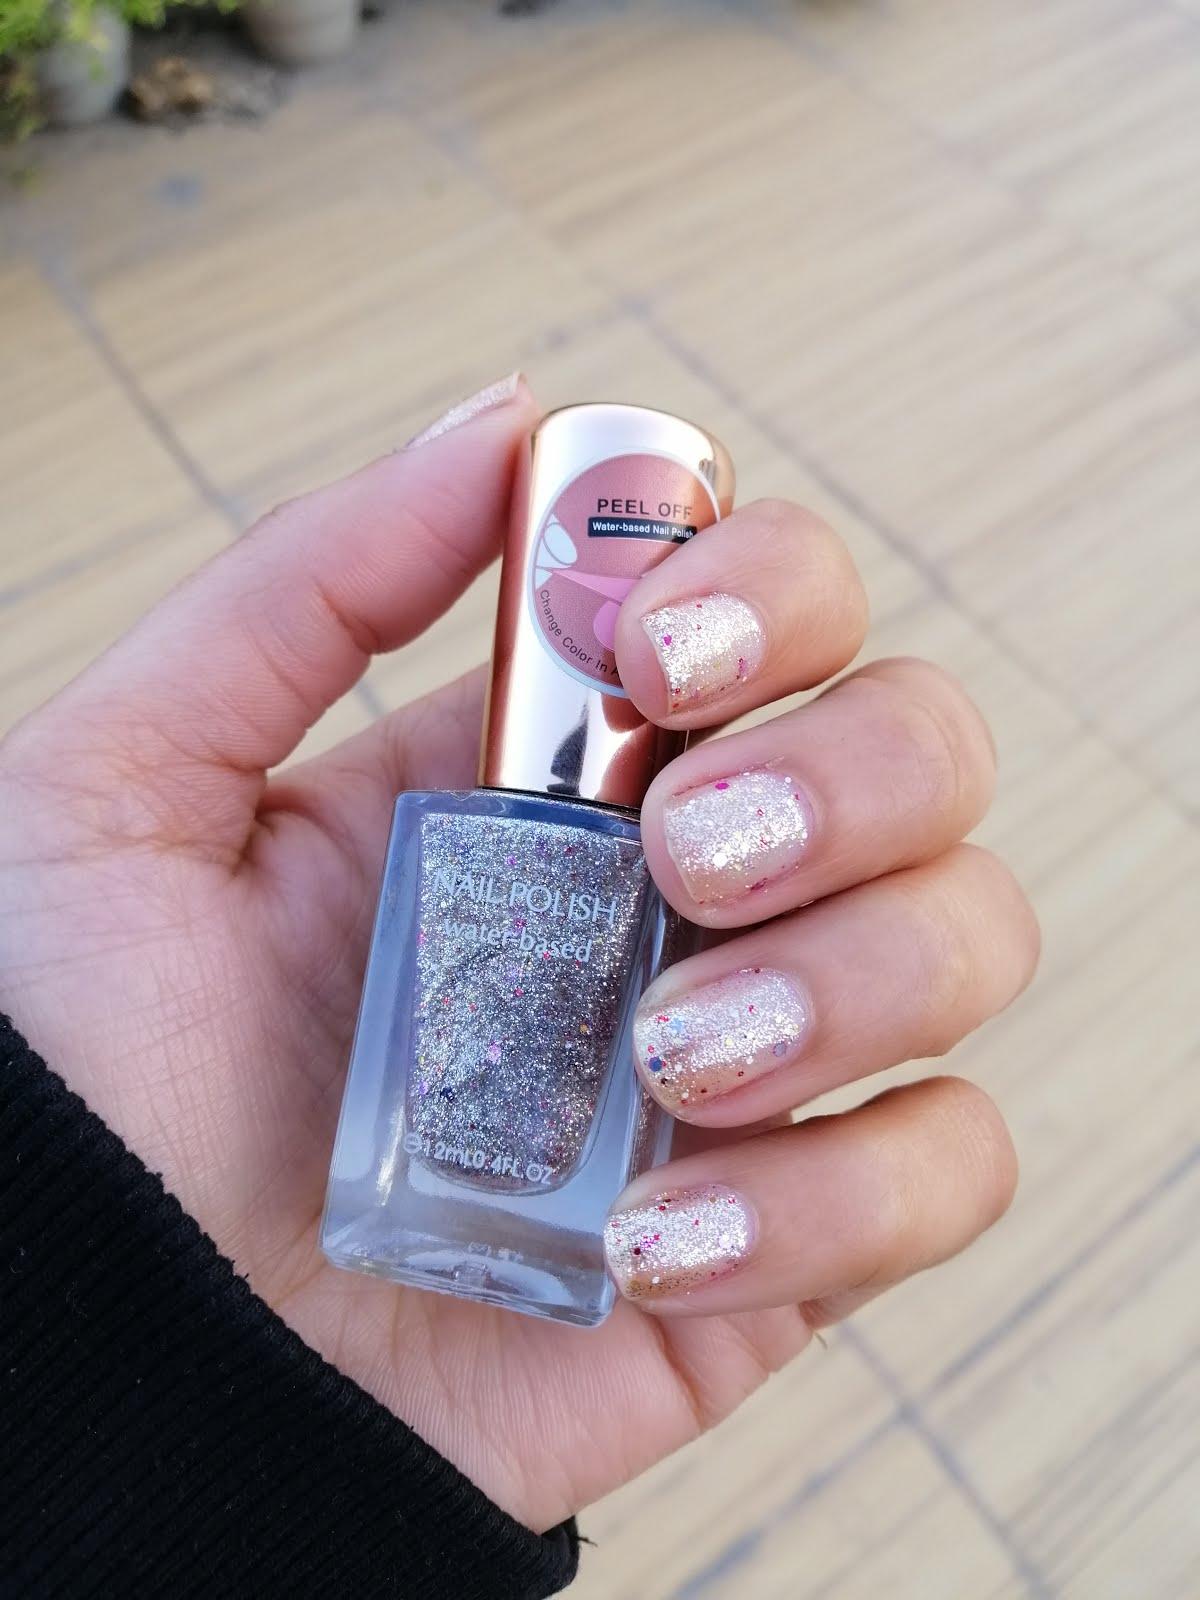 Miniso Peel Off Nail Polish Water Based Review